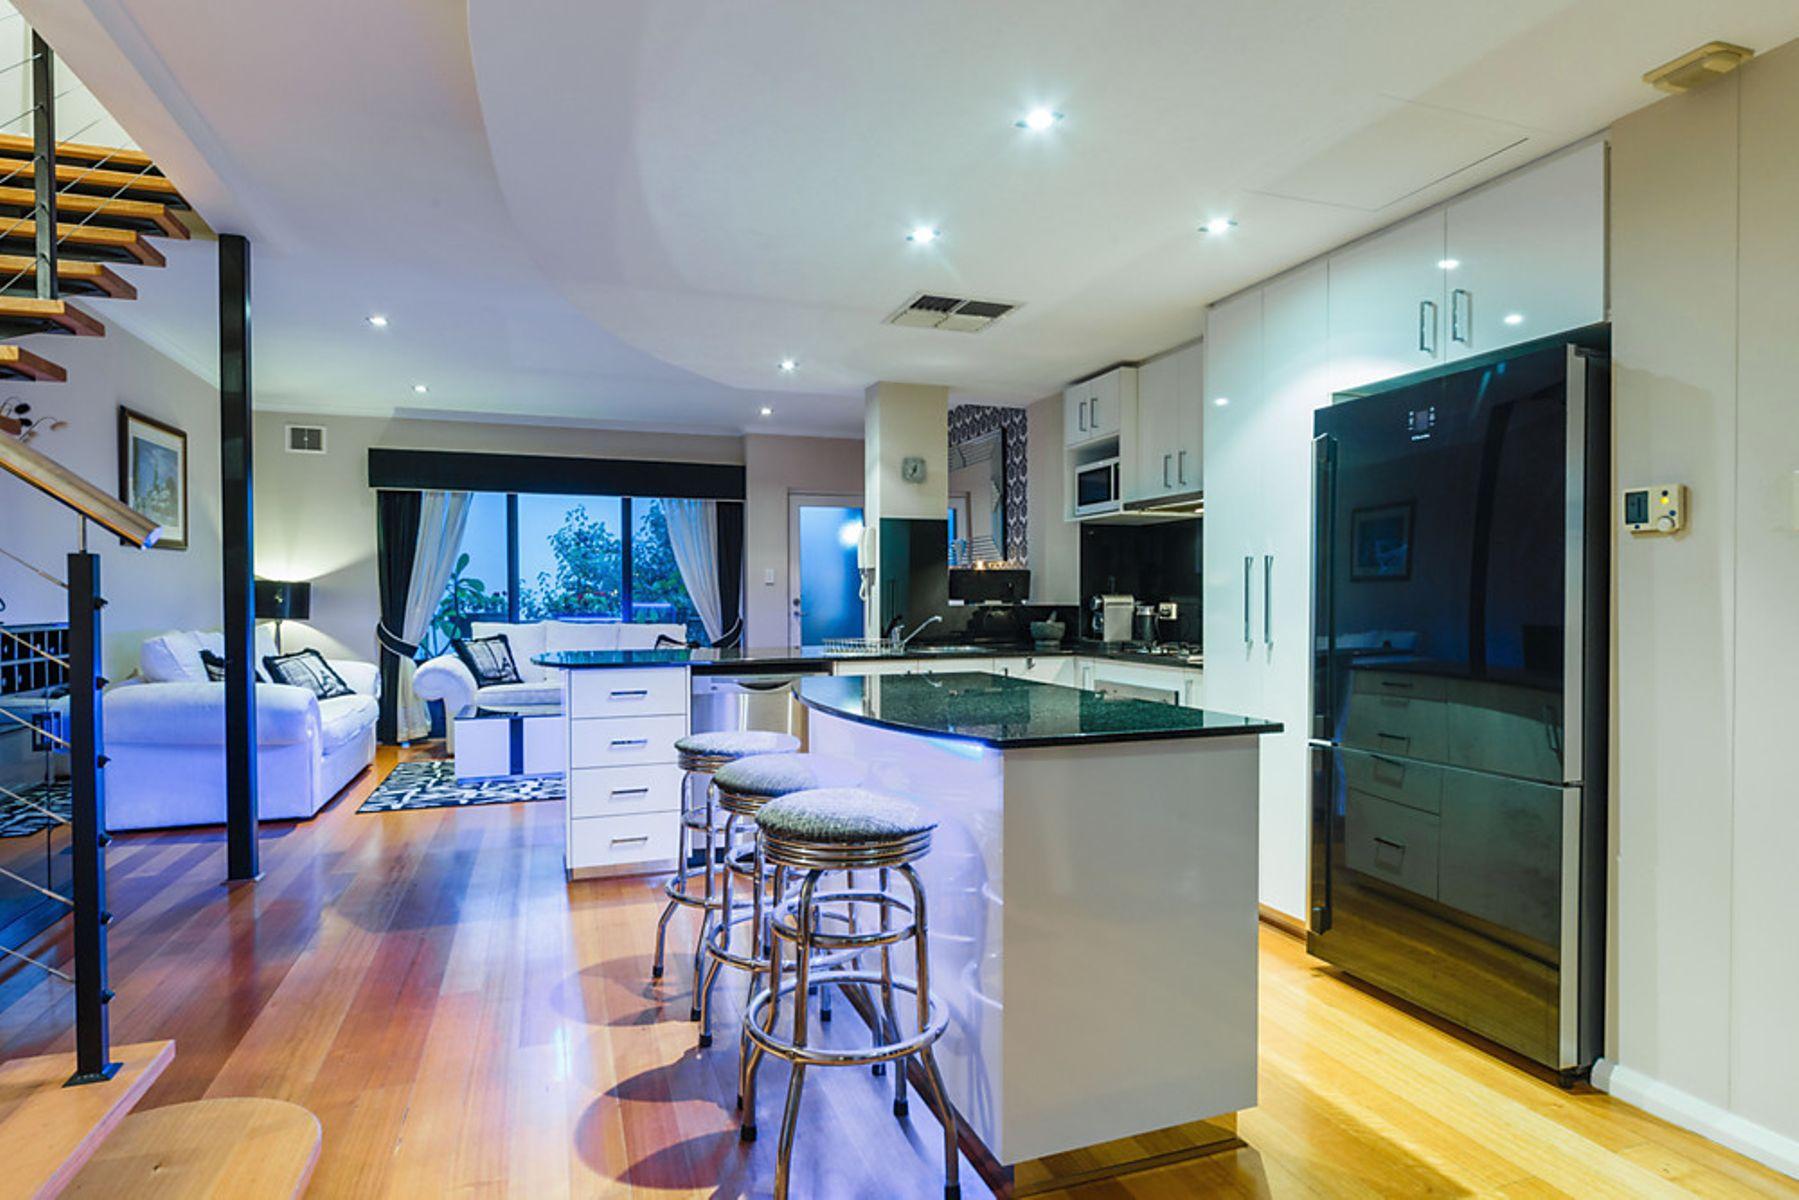 Houses for Sale East Perth   4 Boans Lane, East Perth, WA 6004